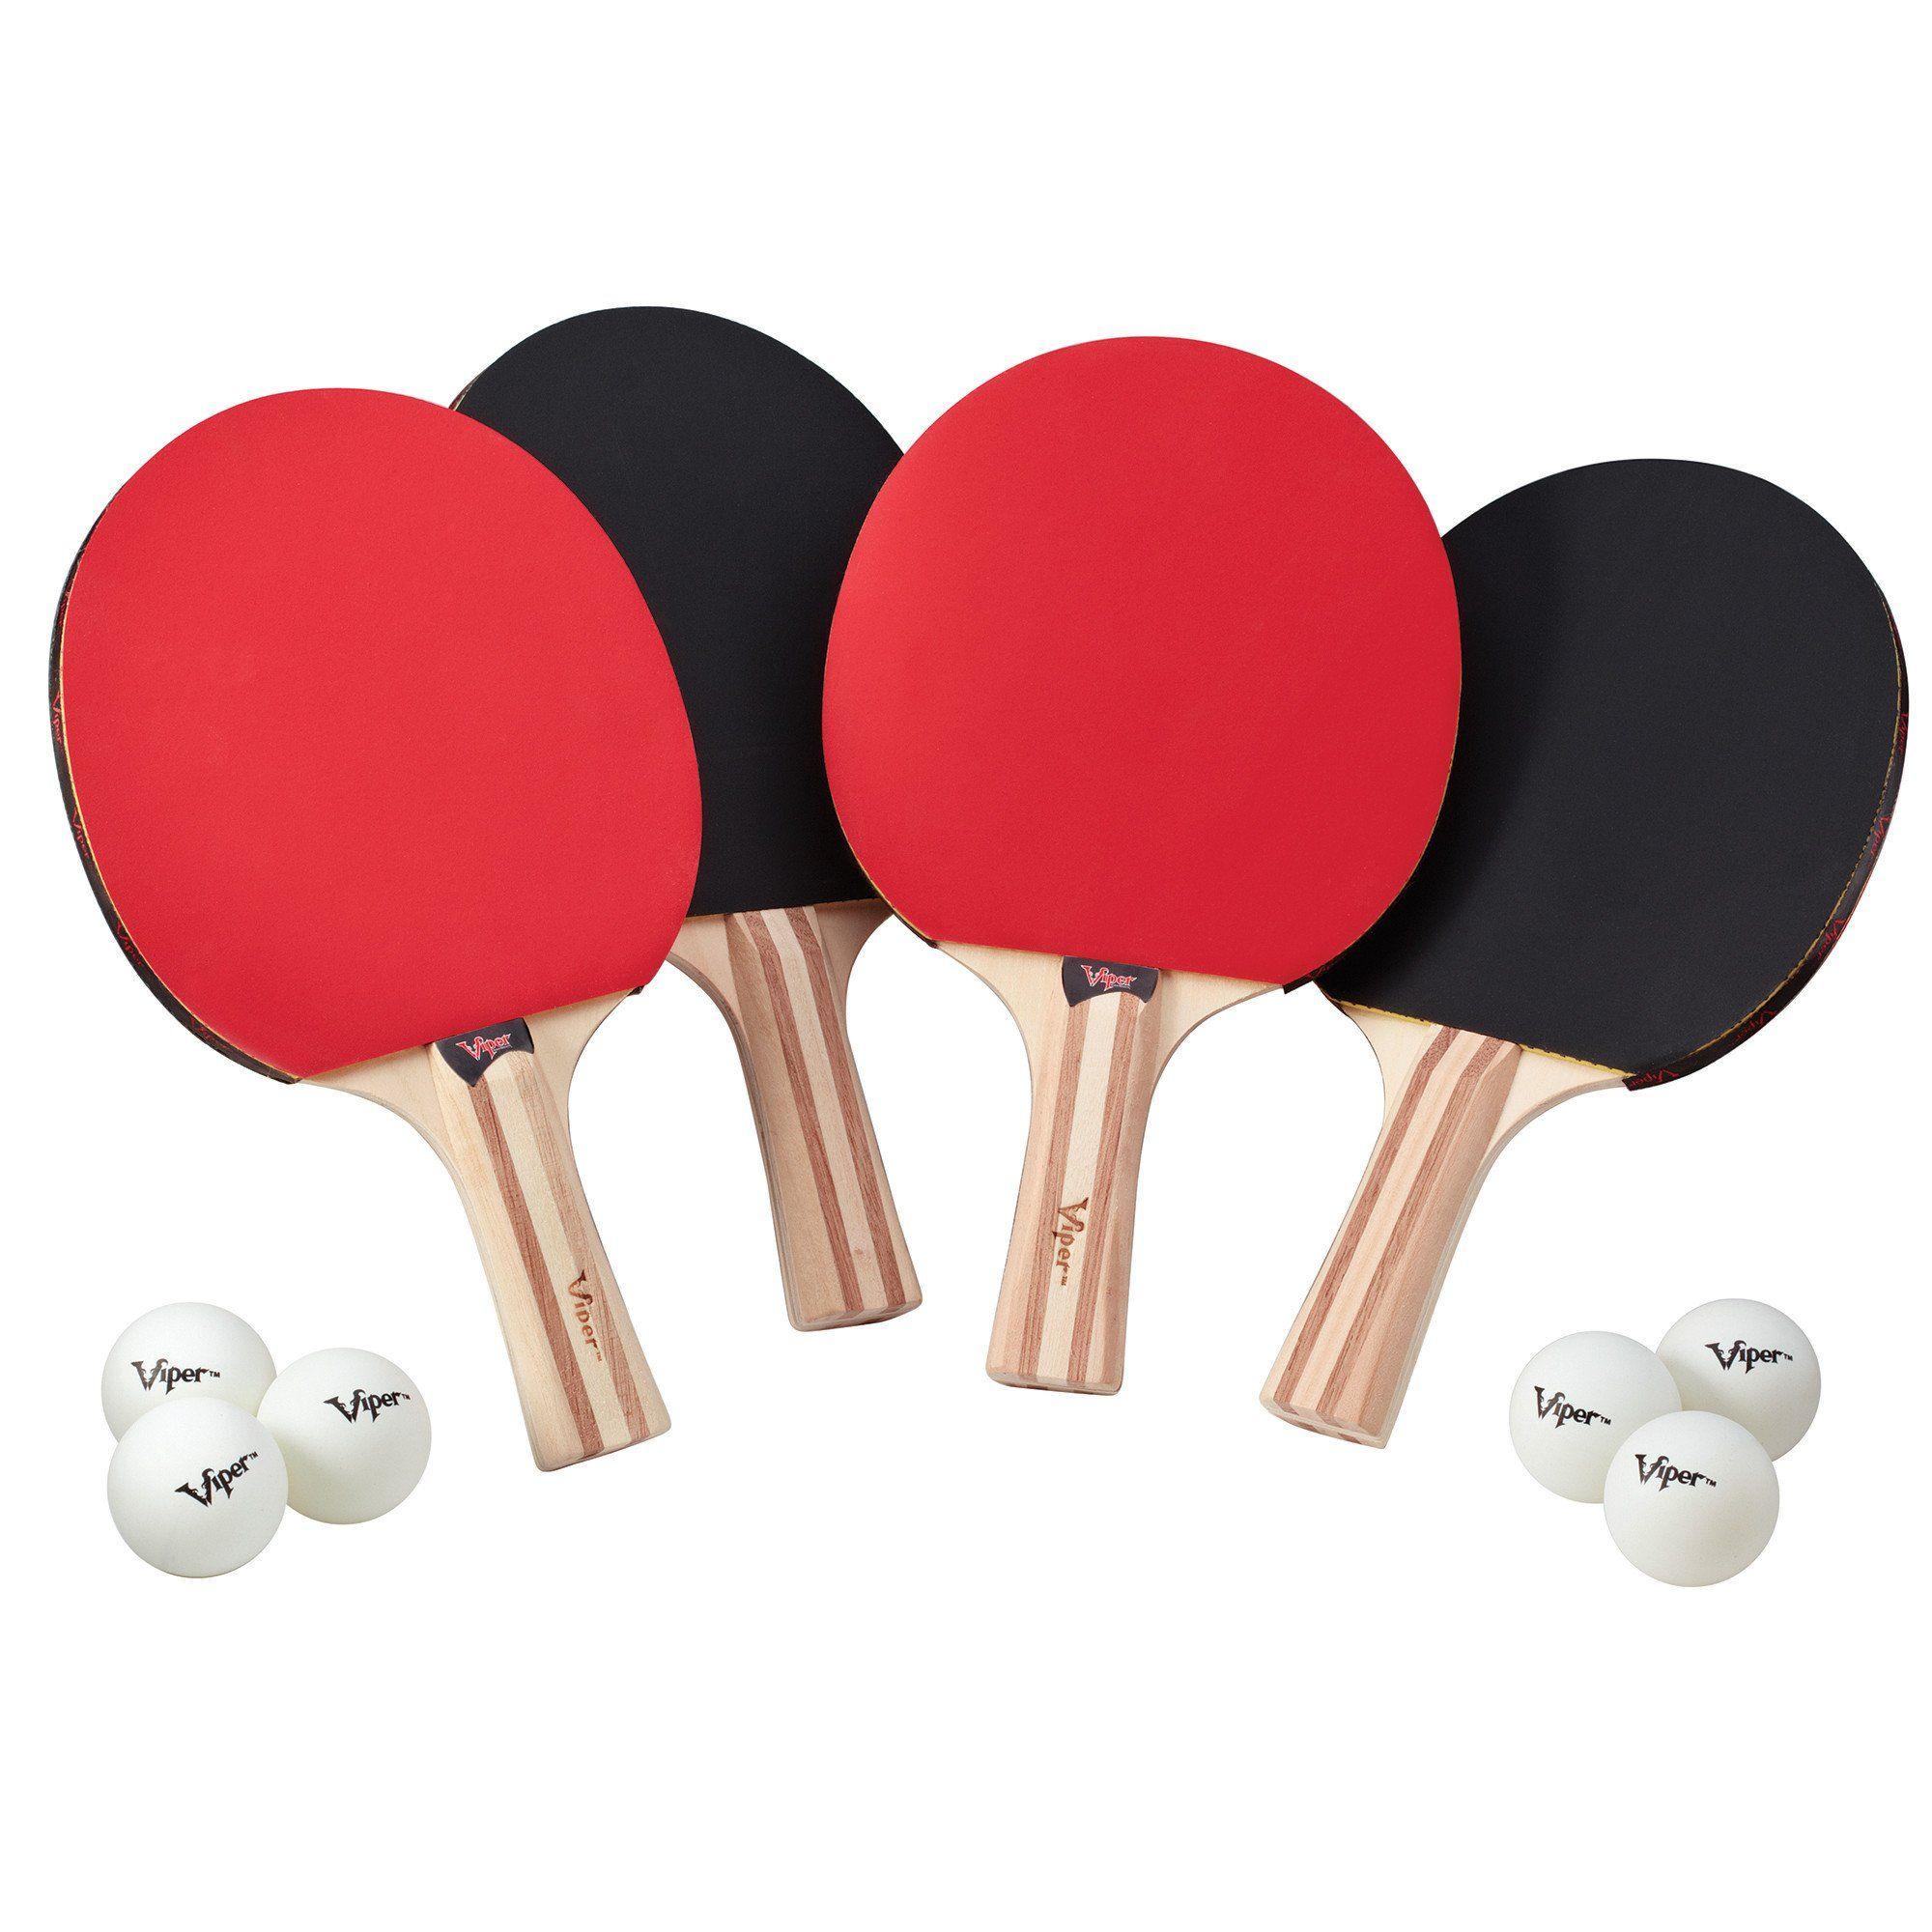 Viper Four Racket Table Tennis Set Table Tennis Set Table Tennis Racket Tennis Set